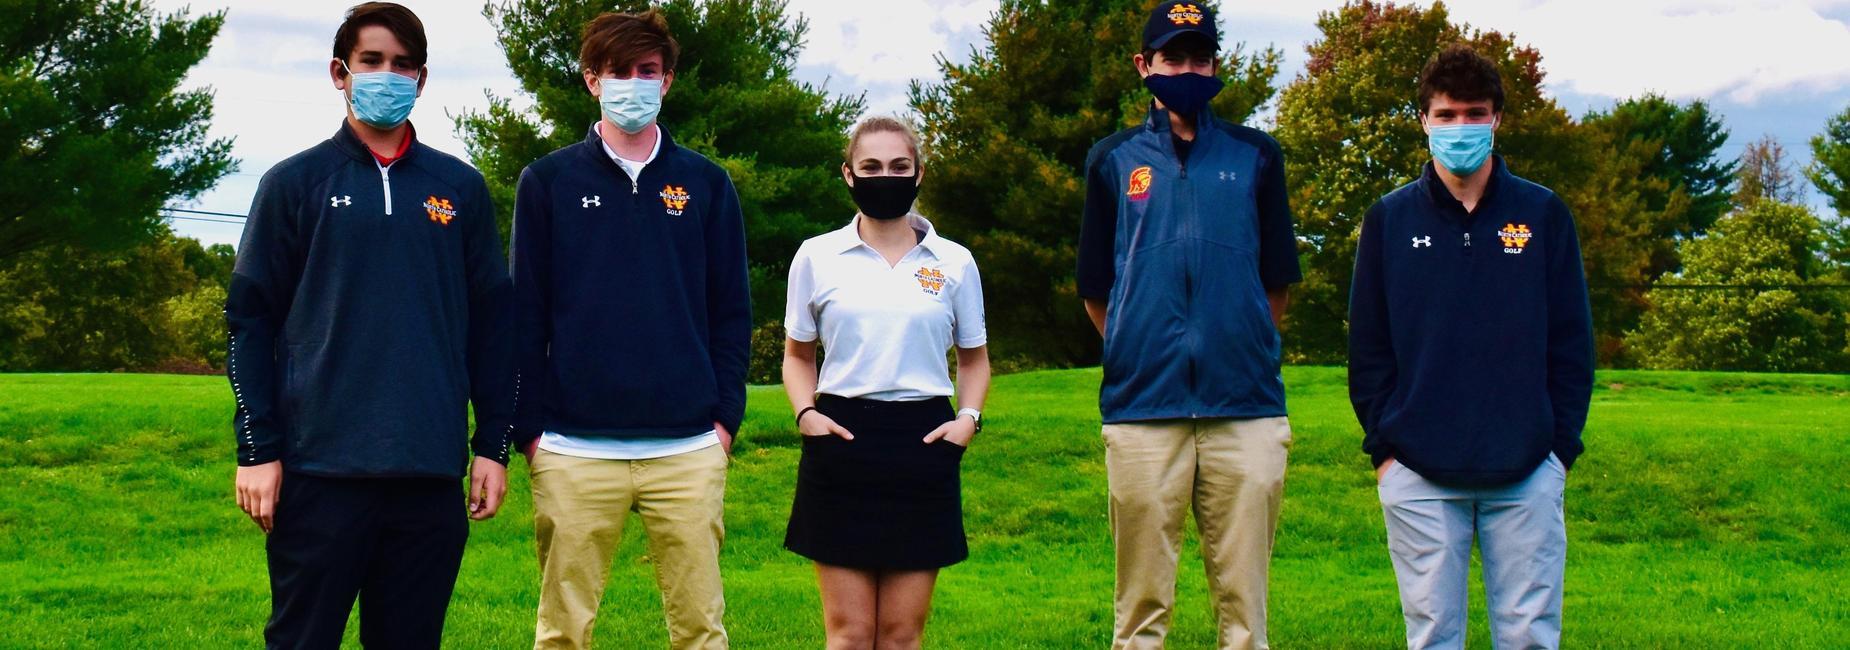 North Catholic Golf Team